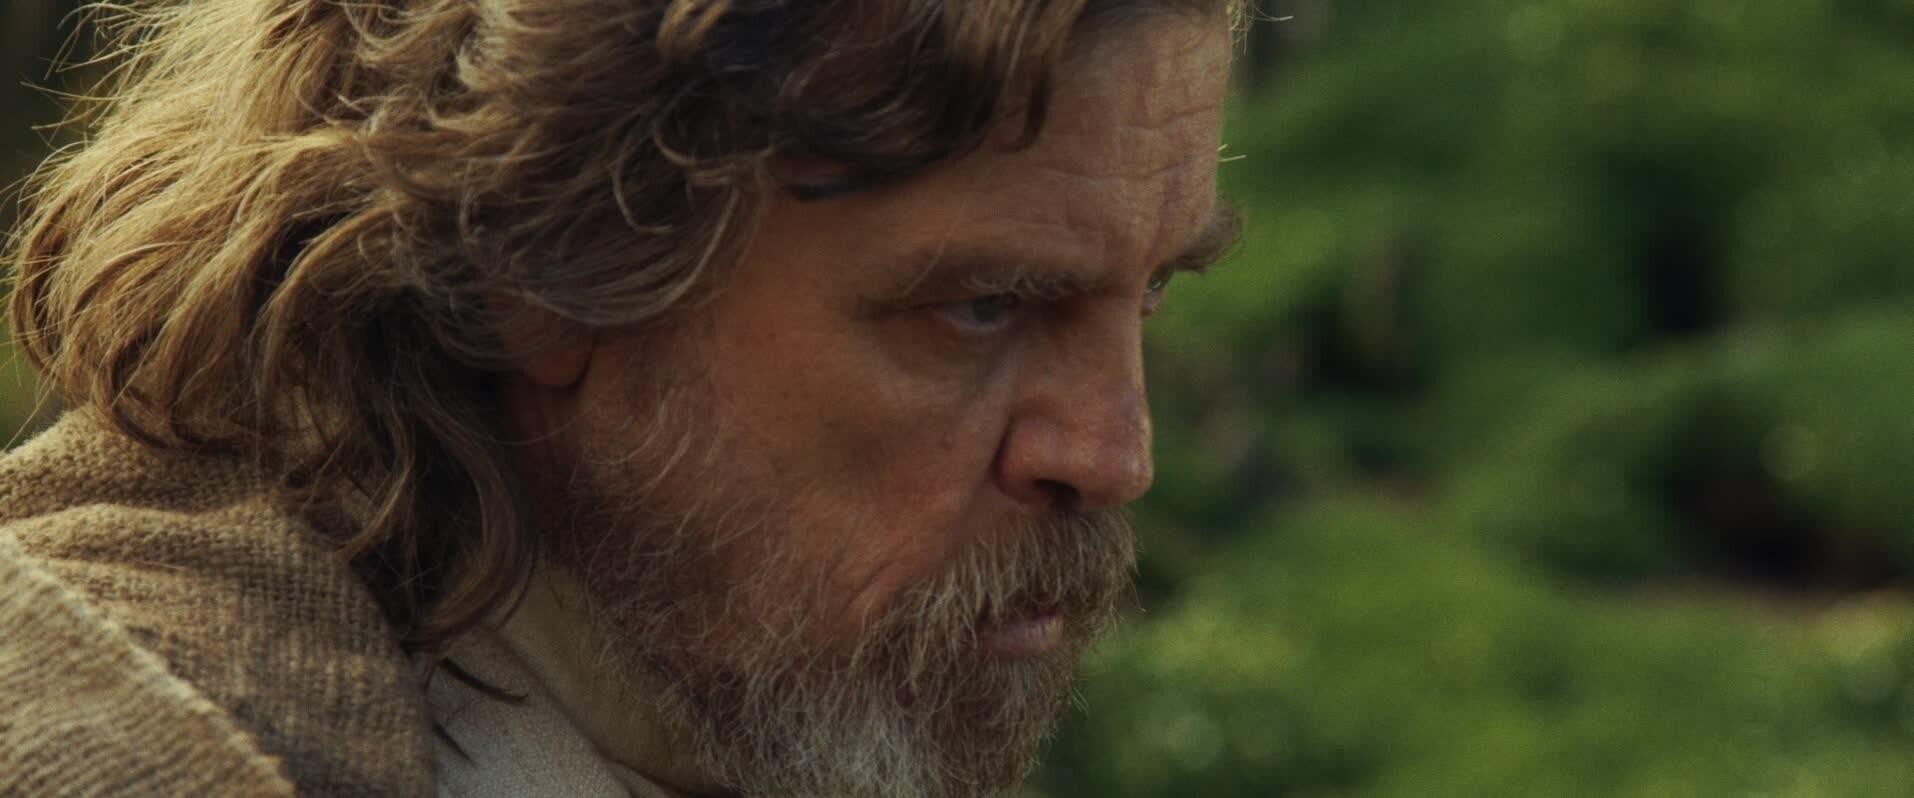 Star Wars 8 : Les Derniers Jedi - Bande Annonce